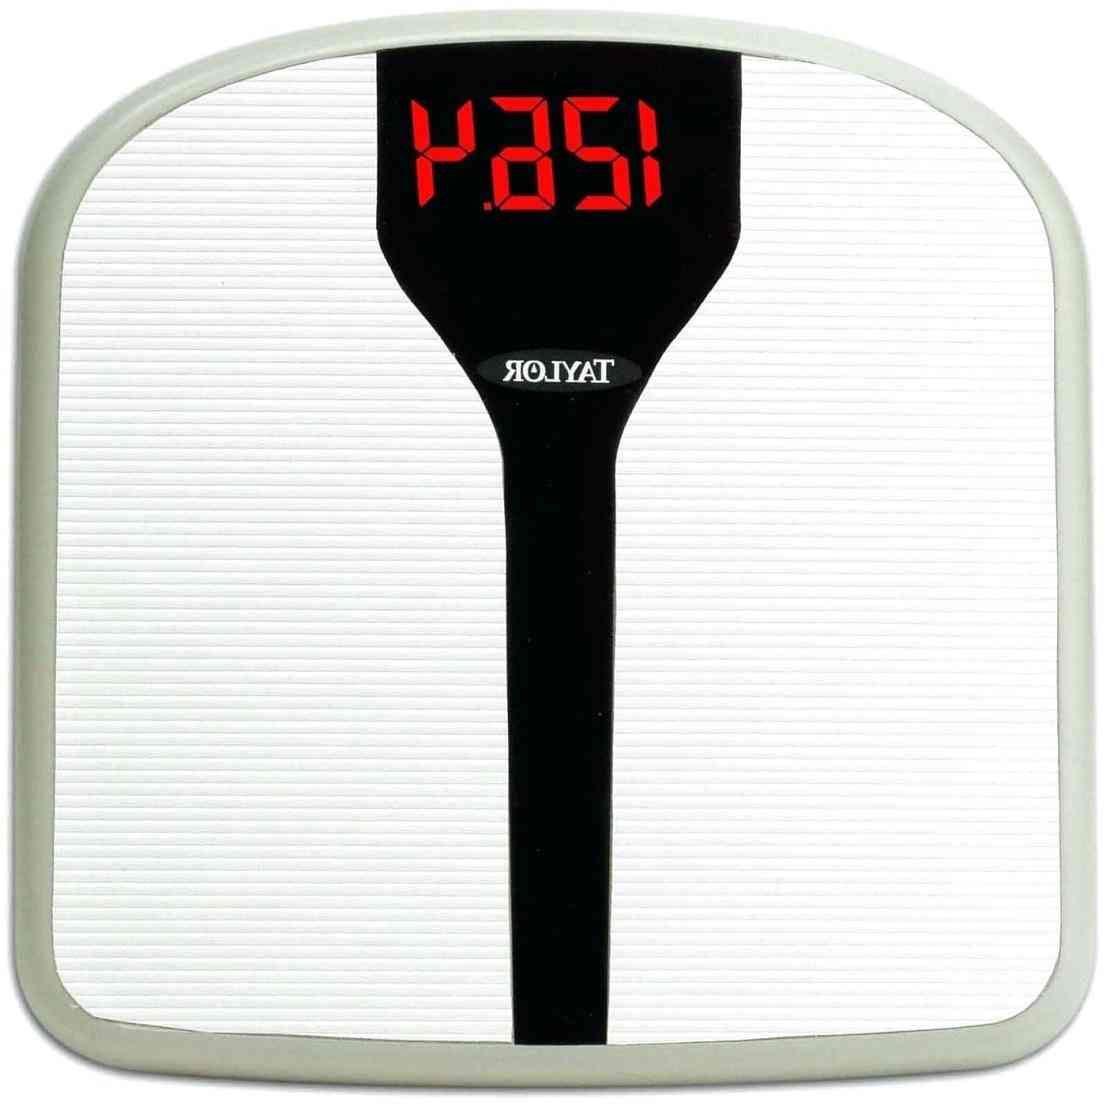 Beau New Post Eatsmart Digital Bathroom Scale Target